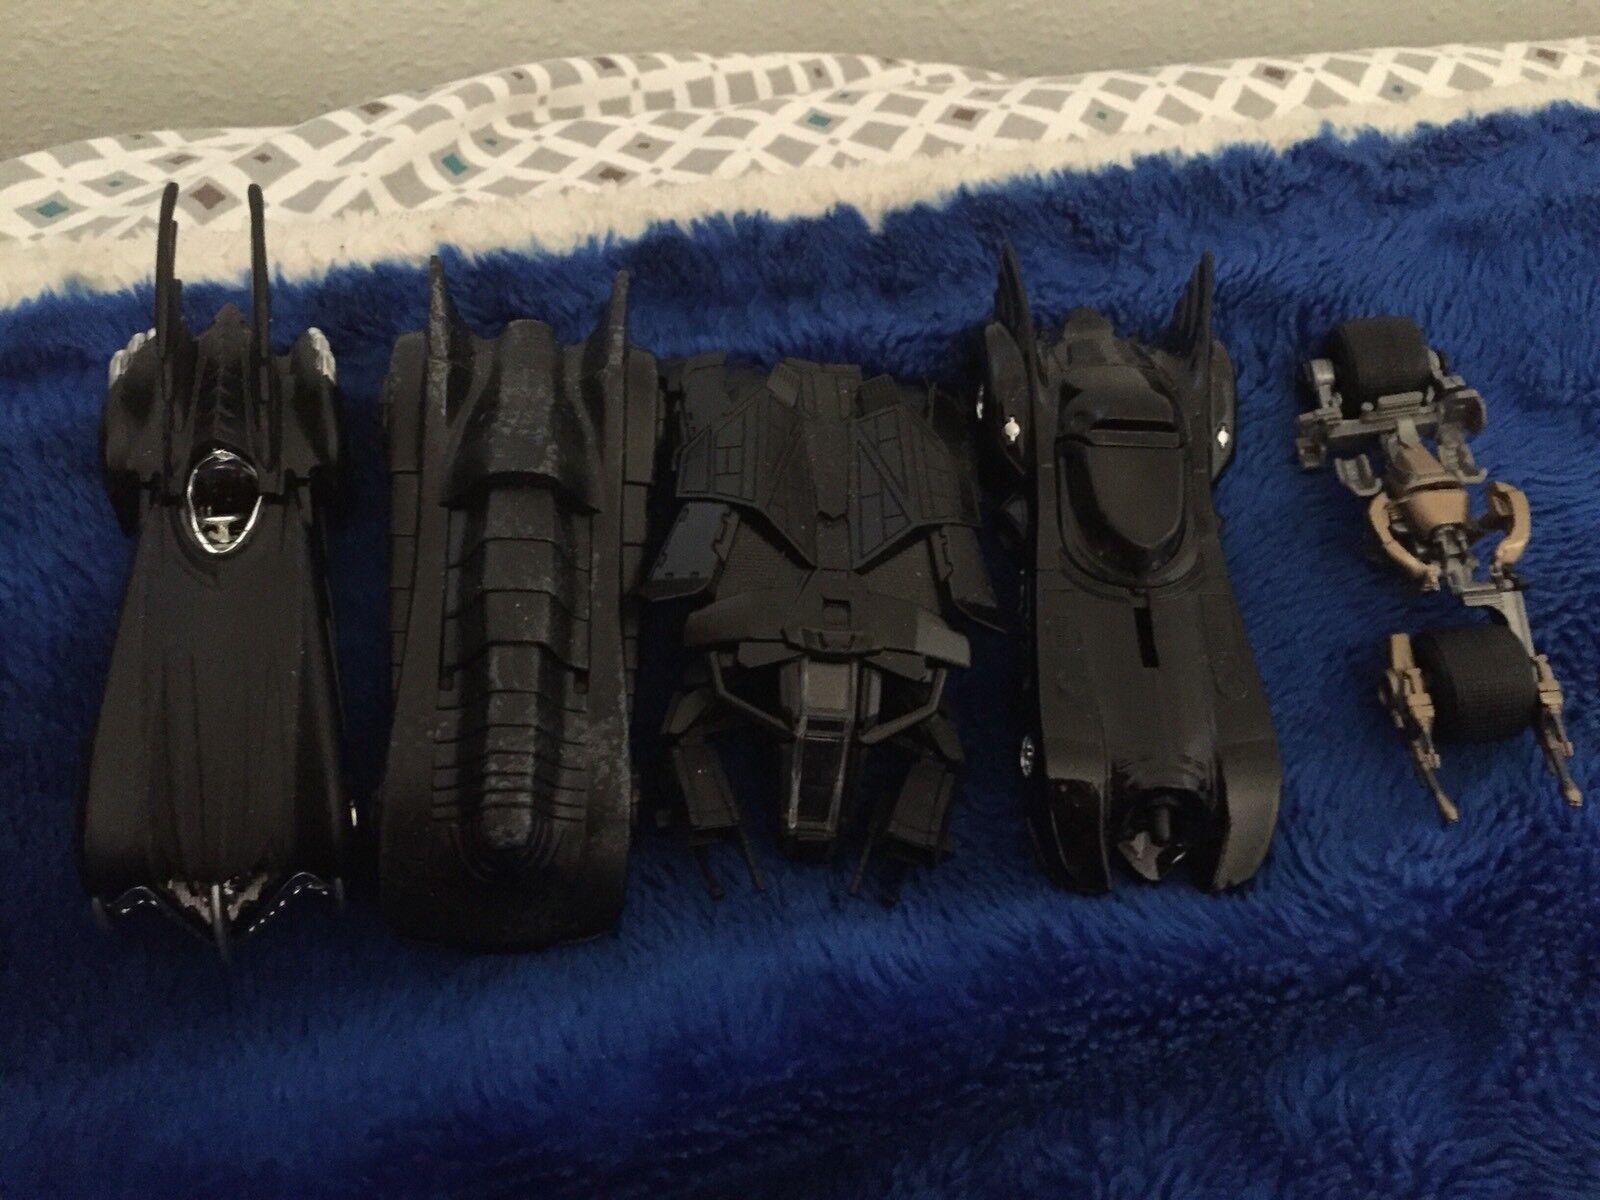 Hot Wheels Batman Batmobile 1 50 Scale Scale Scale Lot Of 5 Loose c2bd3c